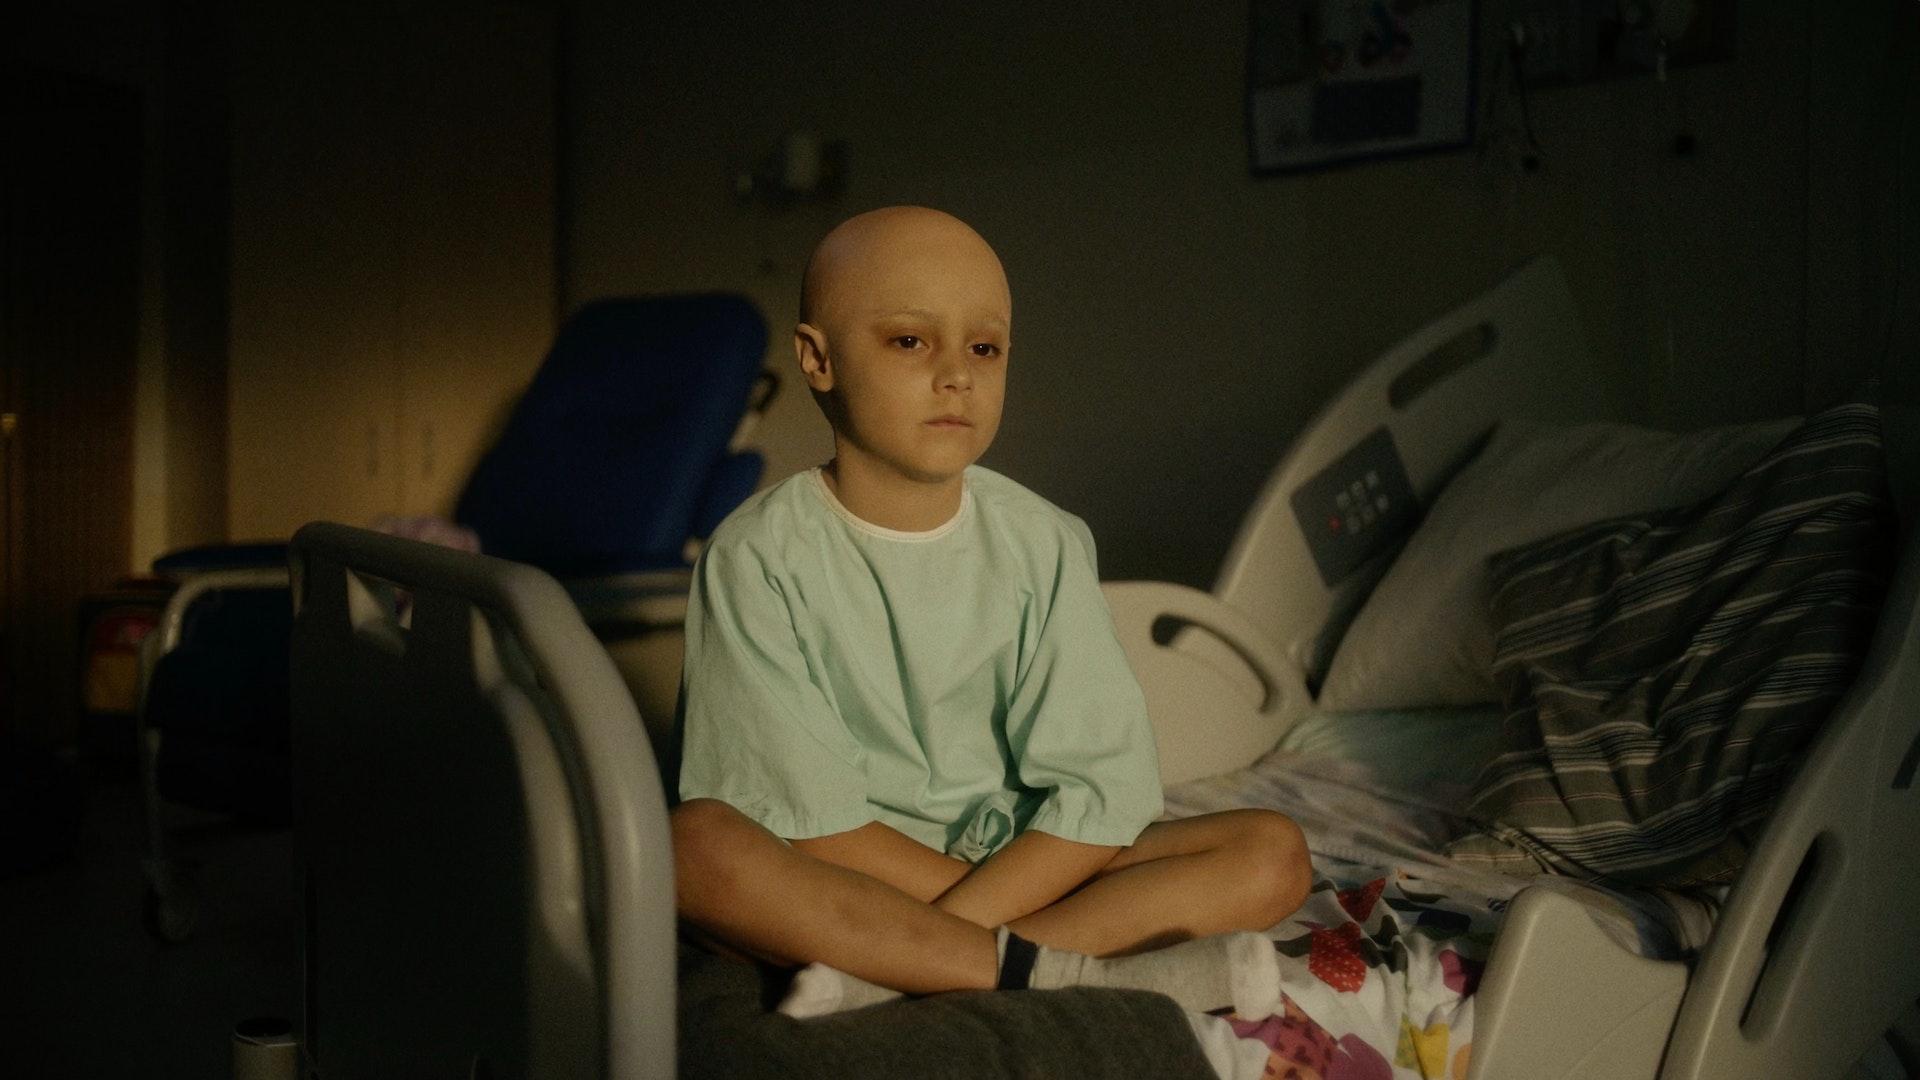 childrens hospital - long live the little brats